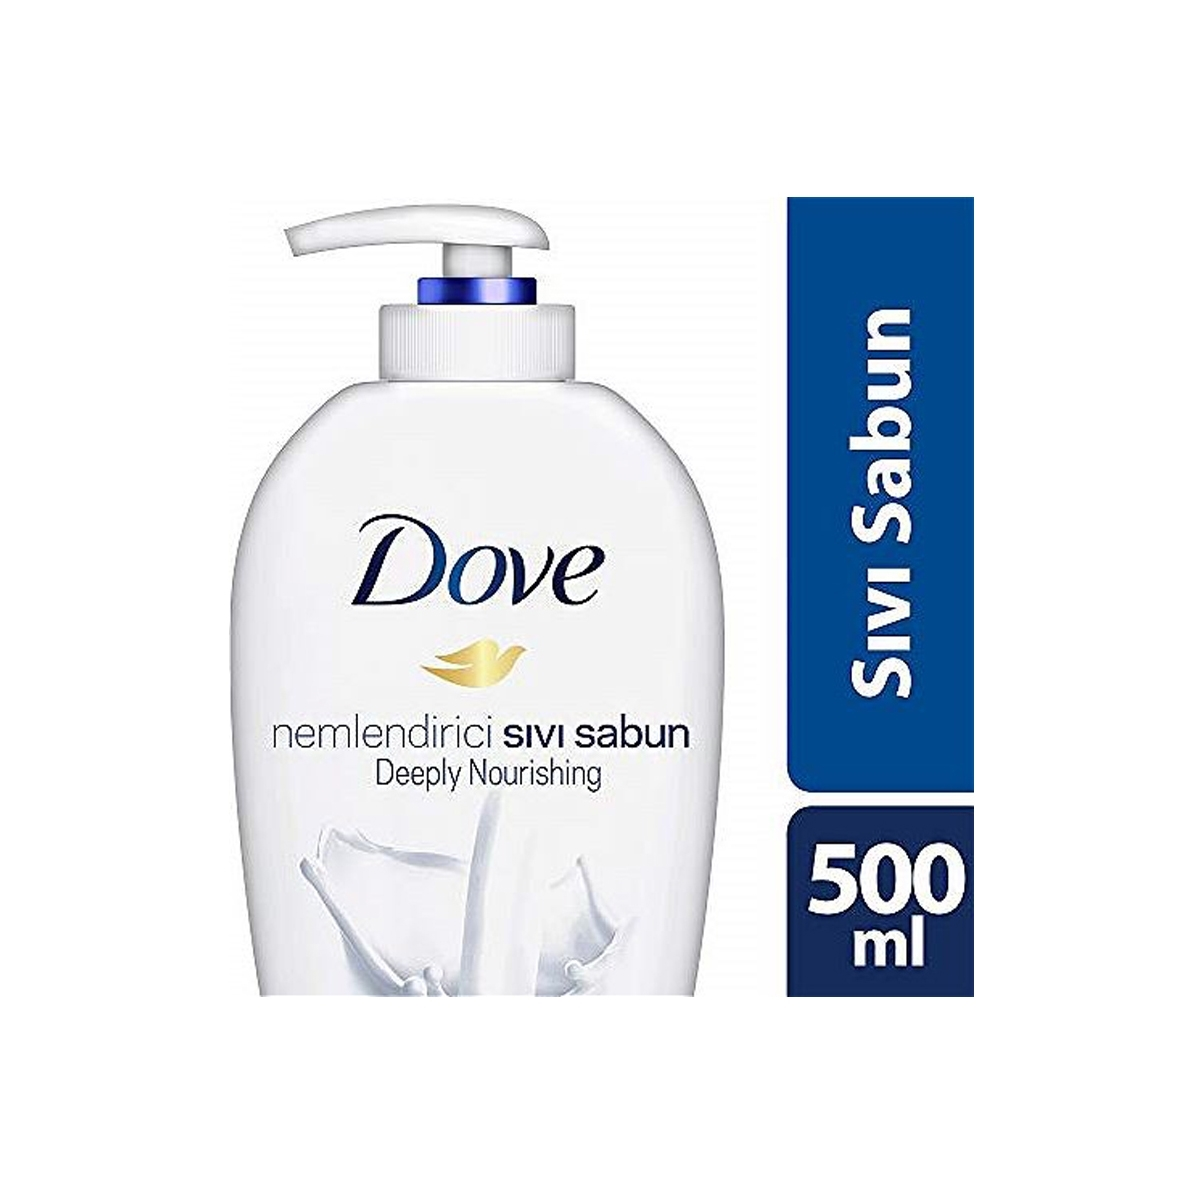 Dove Deeply Nourishing Sıvı Sabun 500ml 12'li Koli resmi